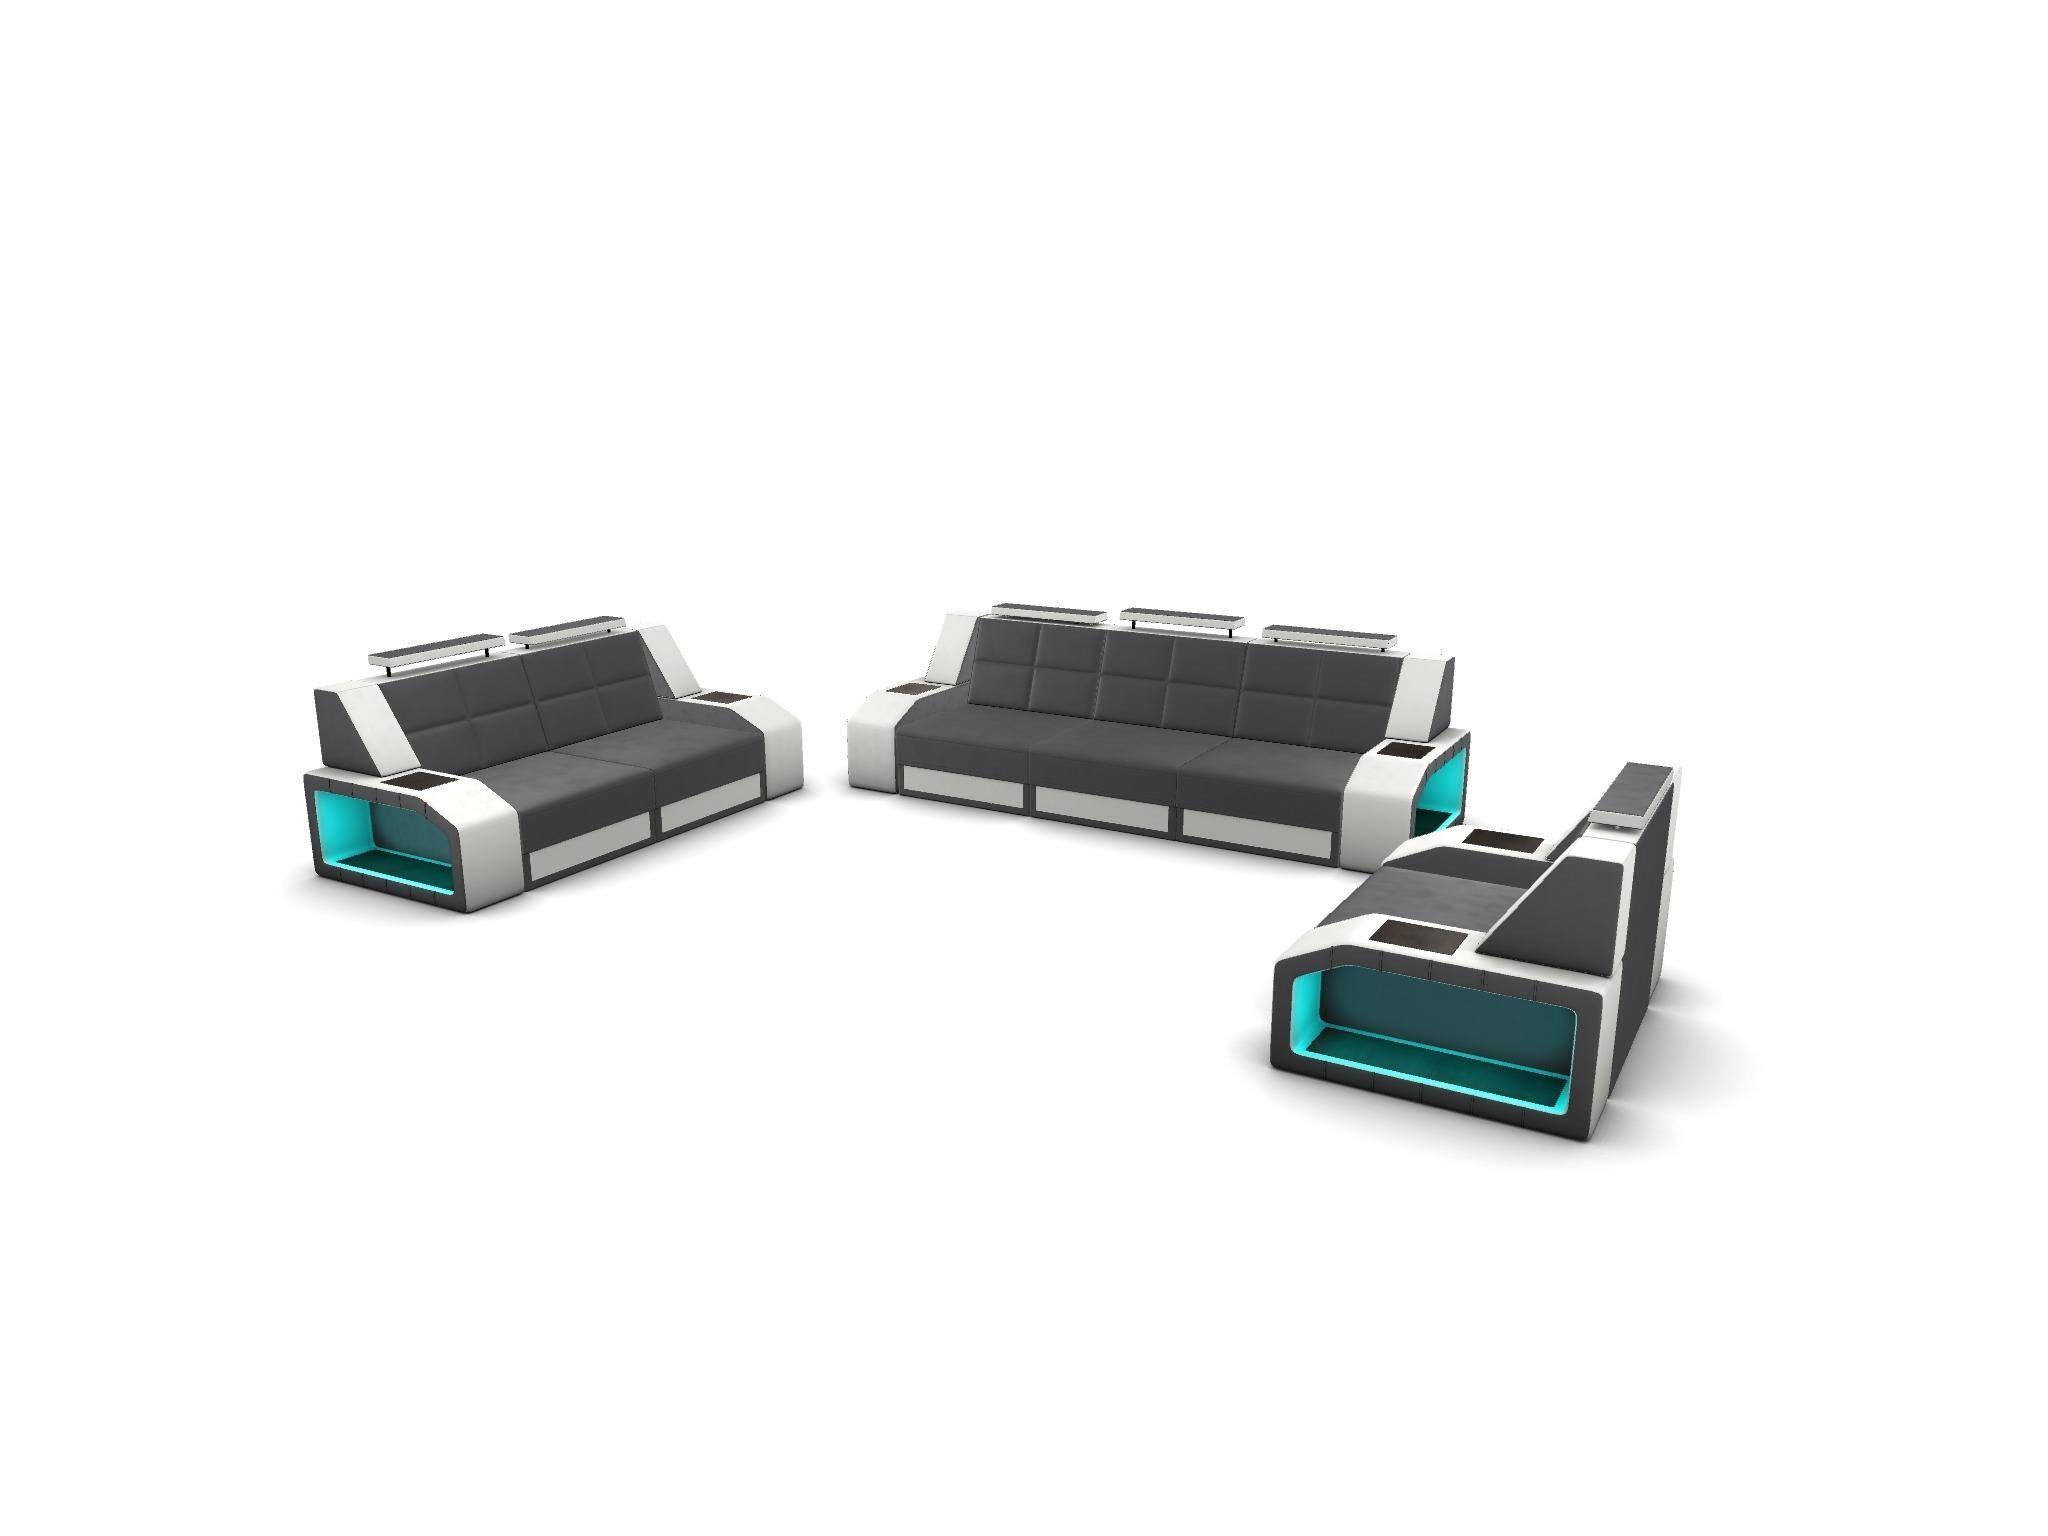 Sofa Set Houston with adjustable headrest - grey-white